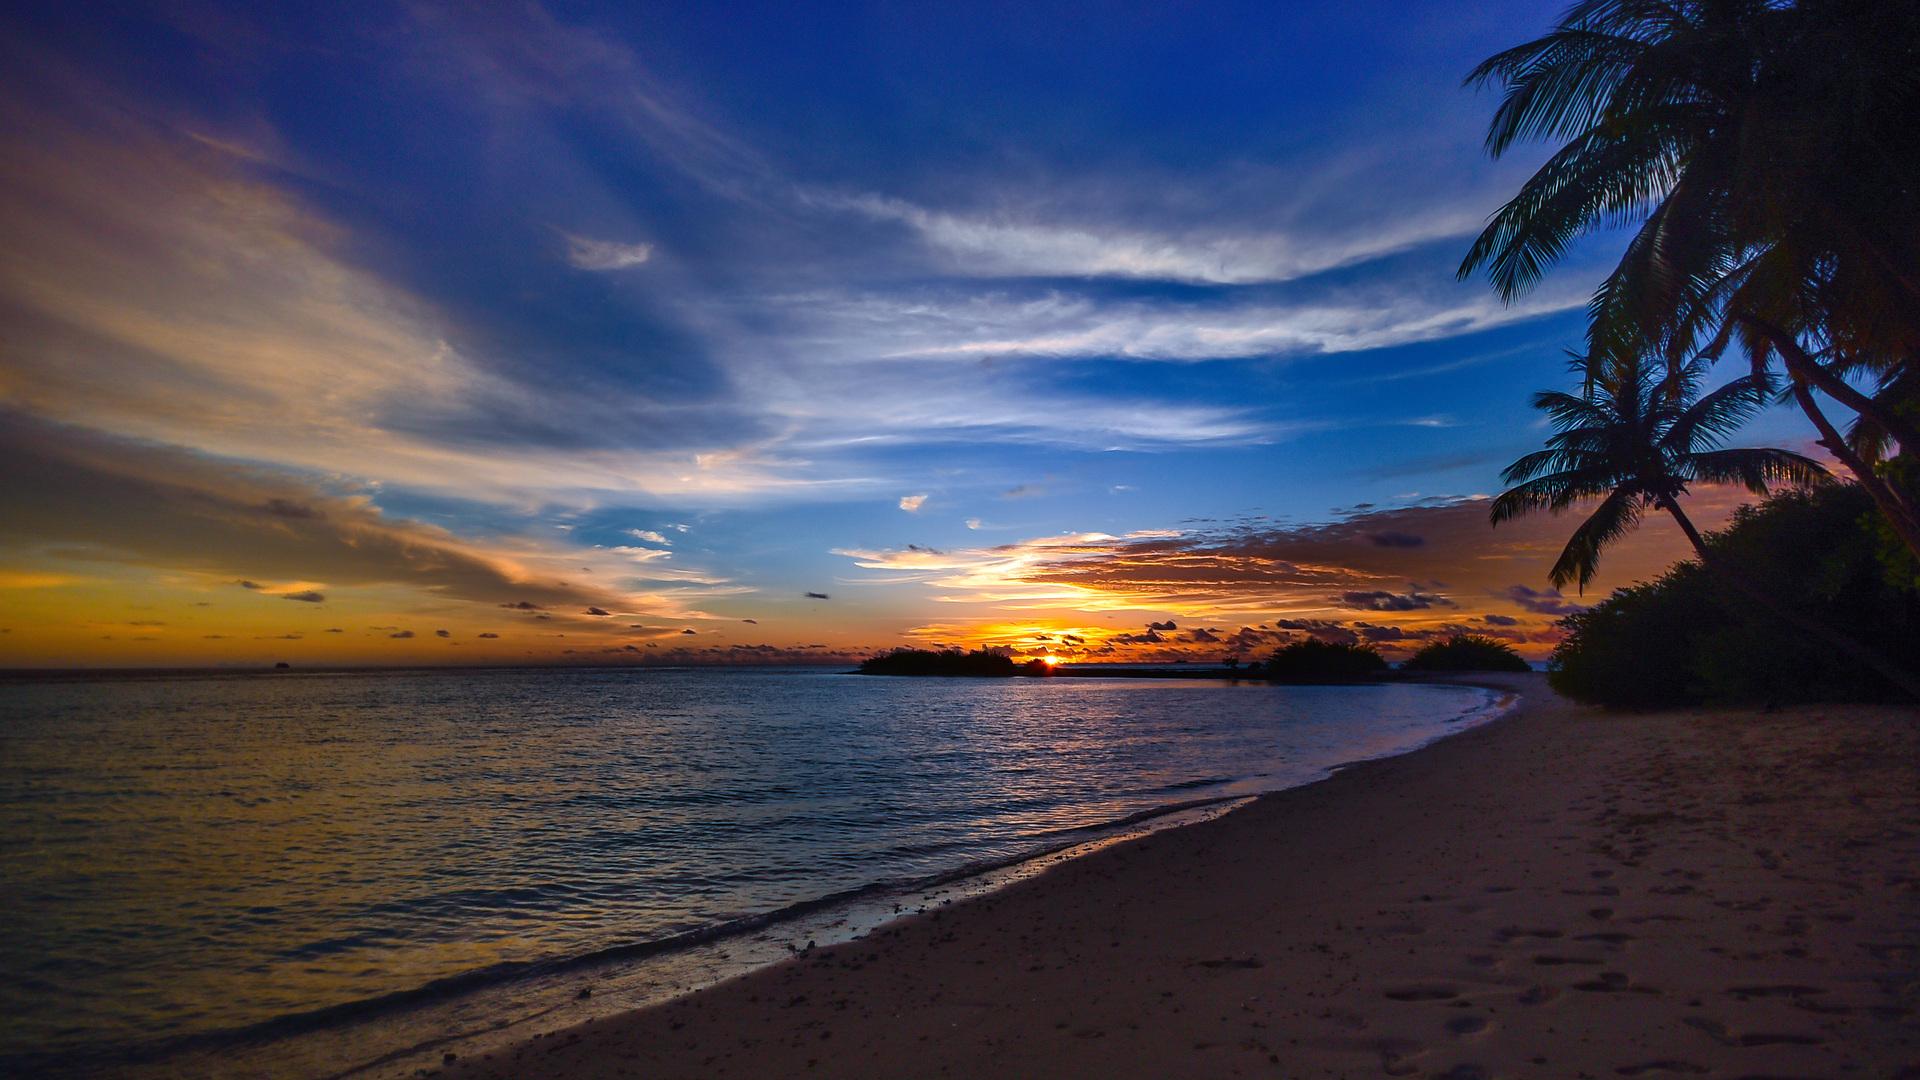 Free Images 4k Wallpaper Beach Calm Cliff Clouds Hd: 1920x1080 Beach Tree Sea Clouds 4k Laptop Full HD 1080P HD